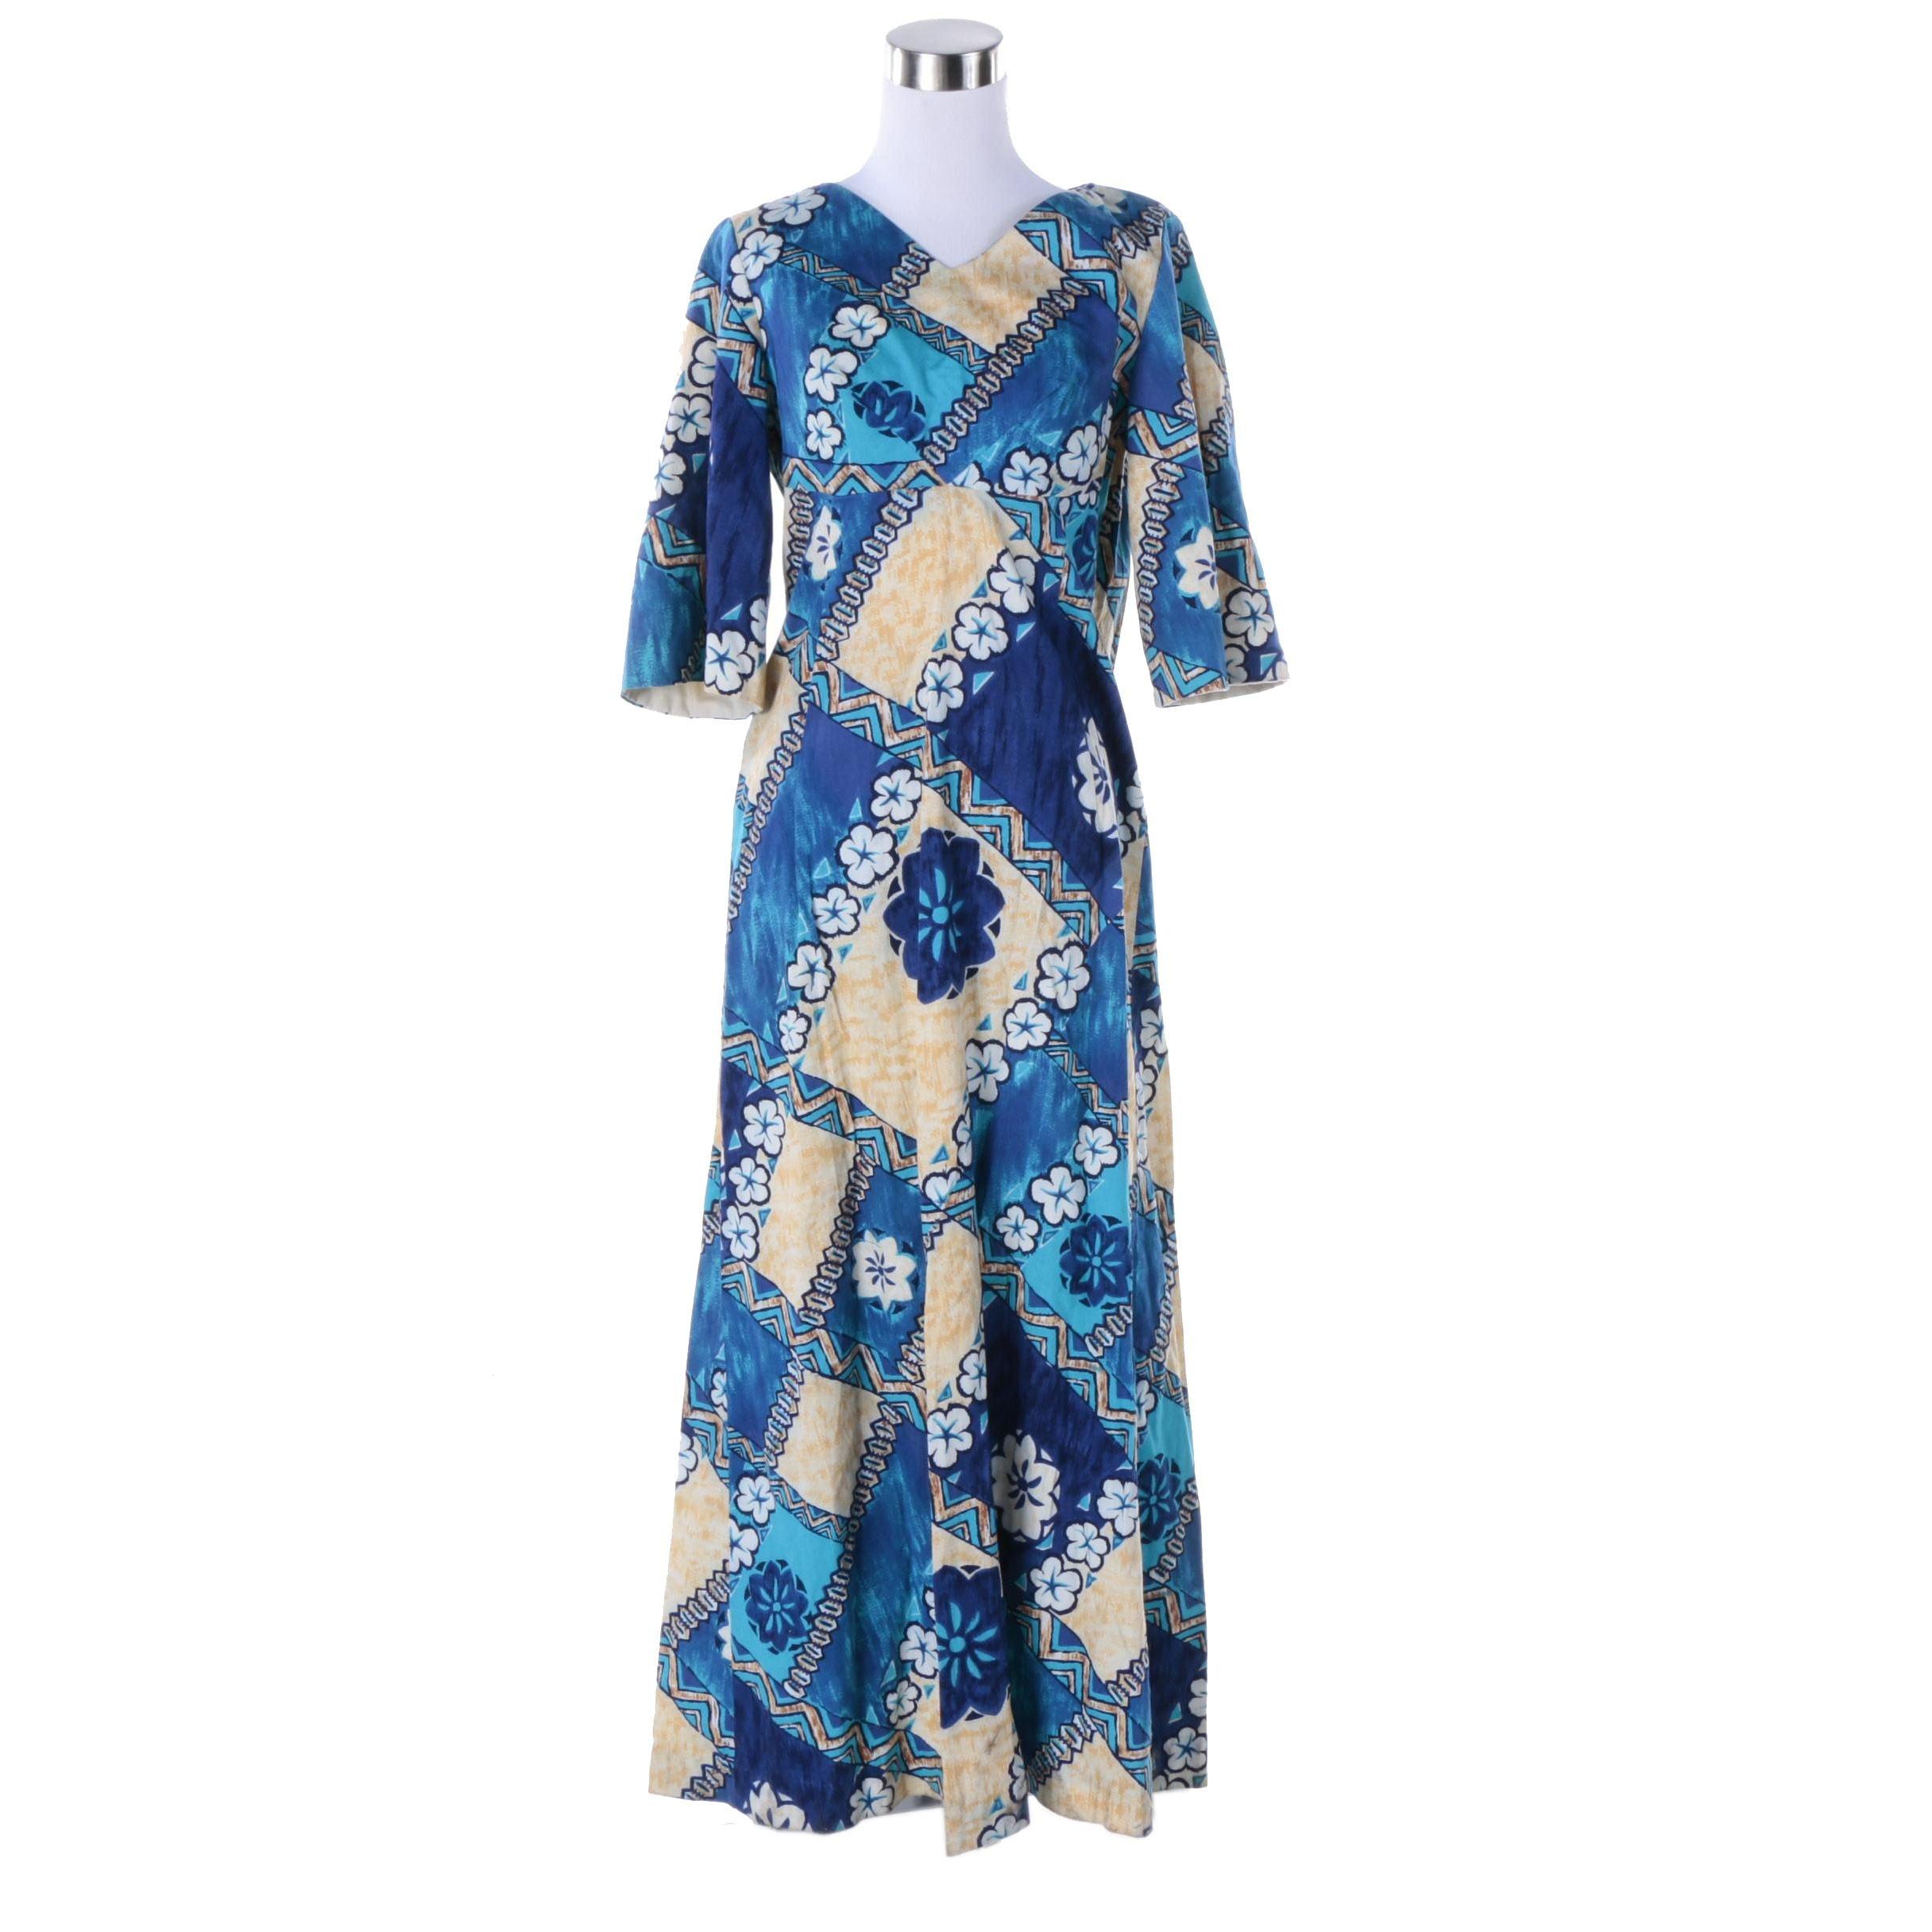 Women's 1970s Vintage Maluna Hawaii Maxi Dress